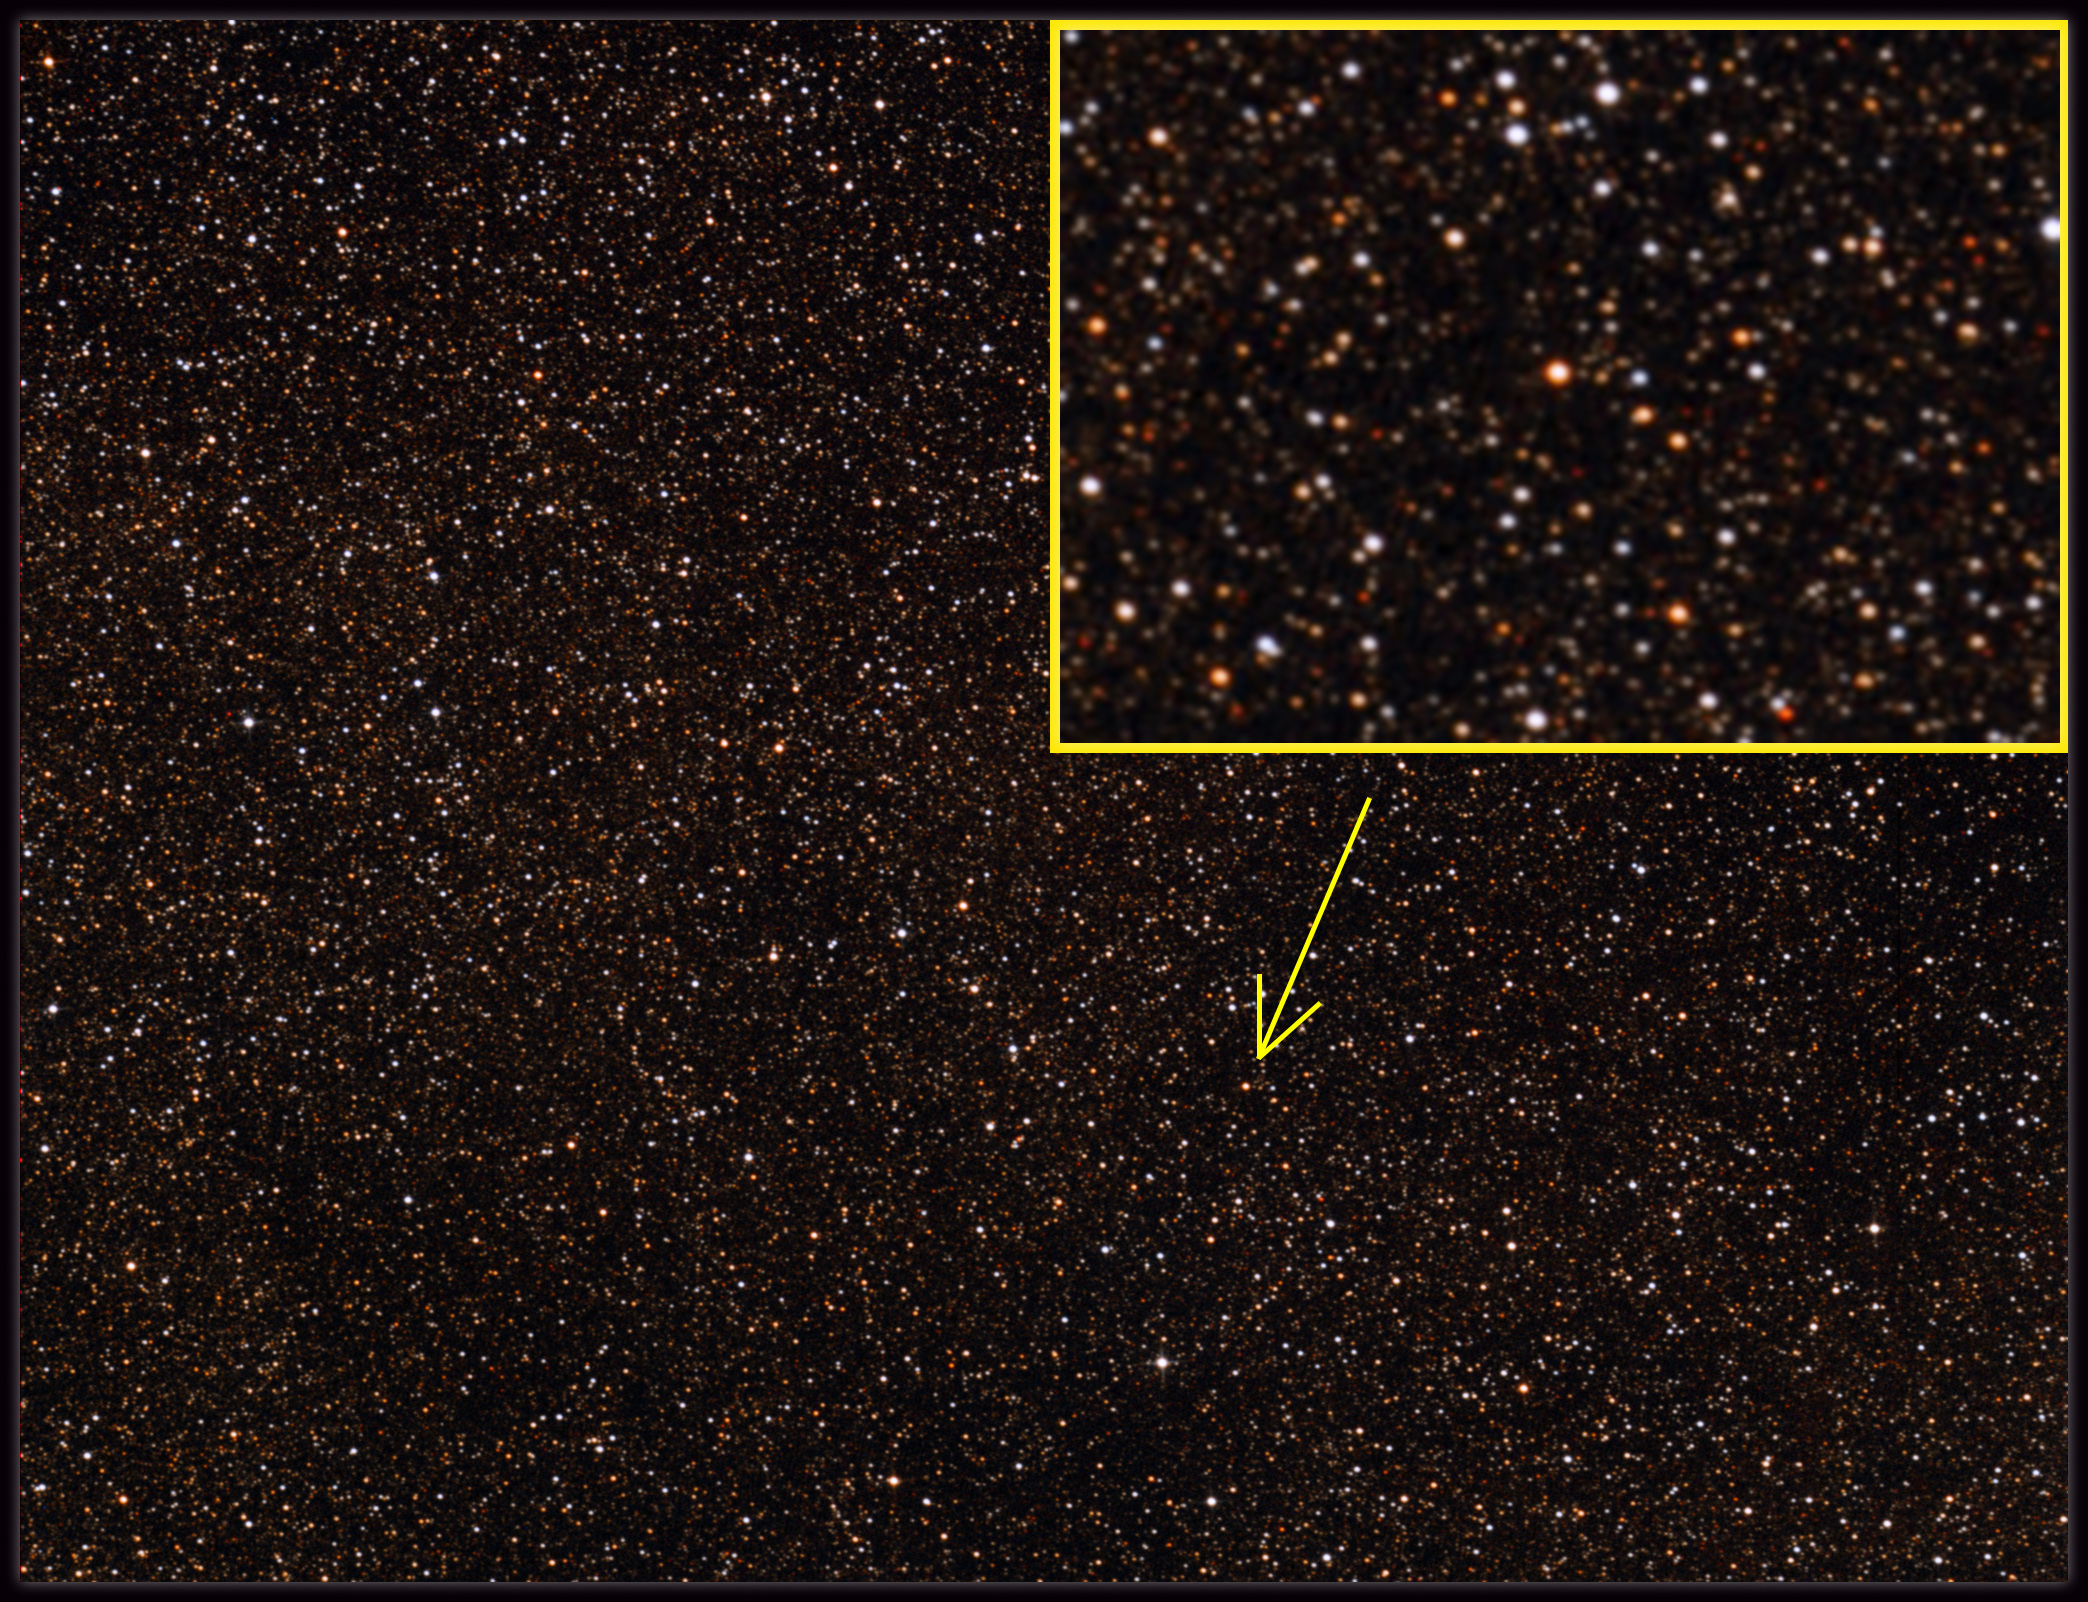 Proxima Centauri  - the nearest star to the sun